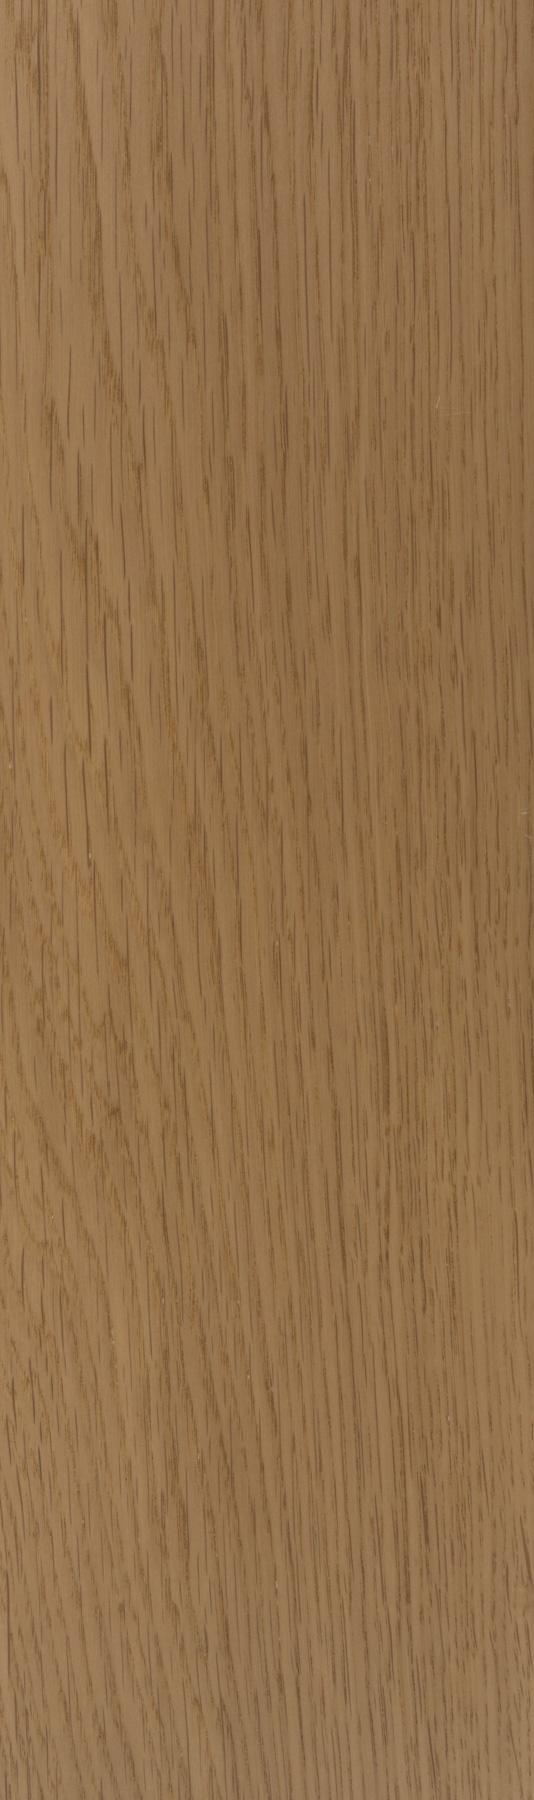 maderas-terramont-loft-mate-white-oak